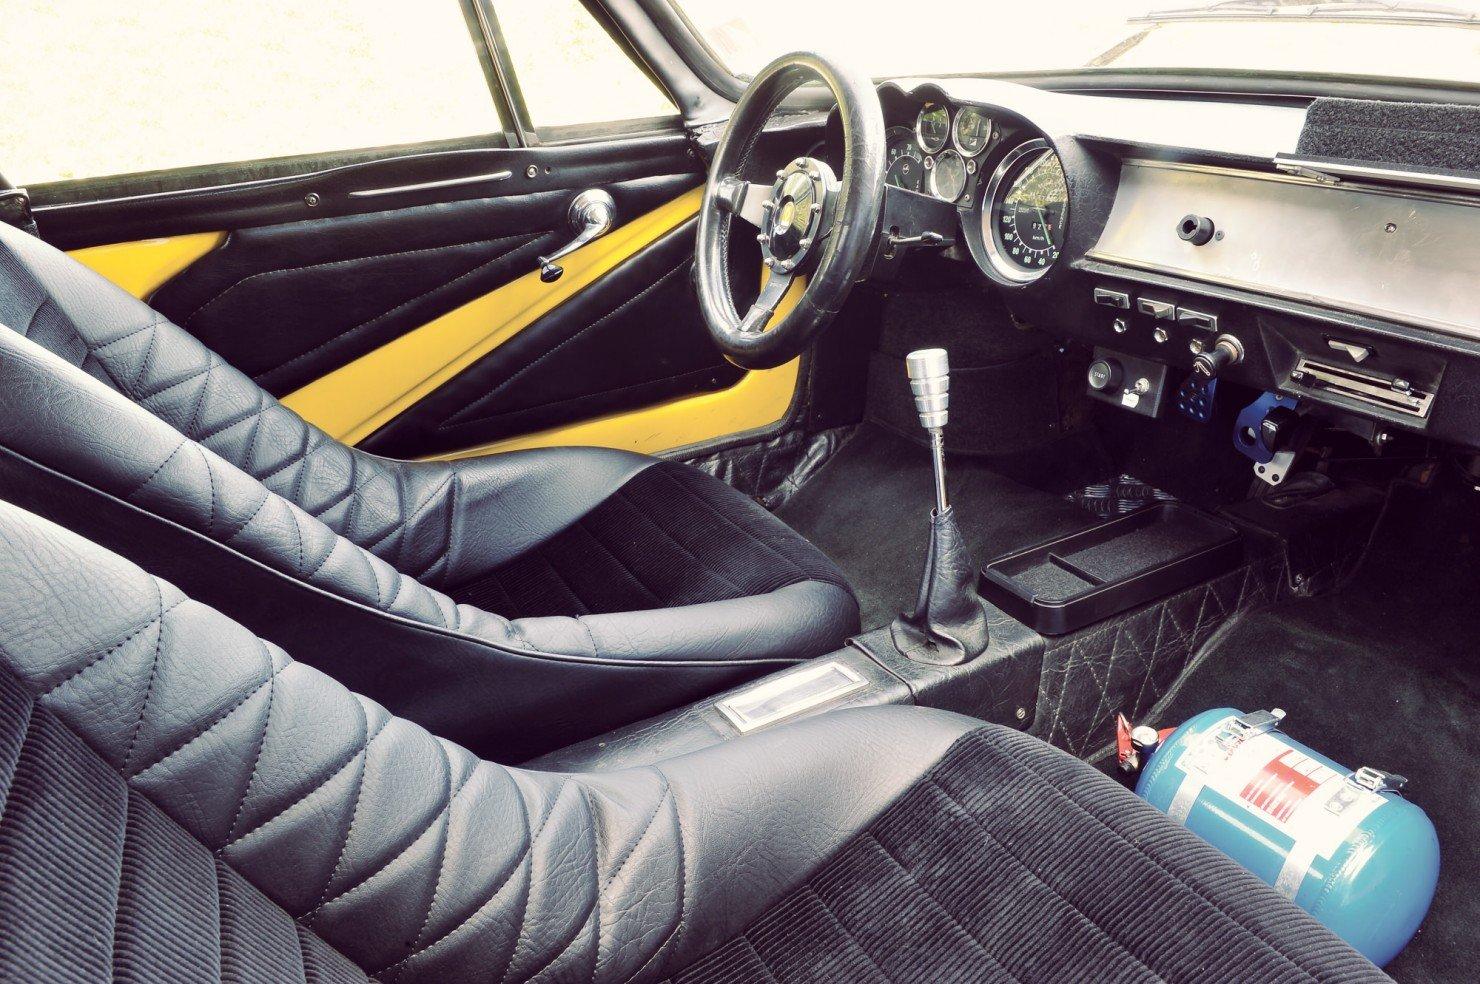 Alpine A110 Car 8 1480x984 Alpine Renault A110